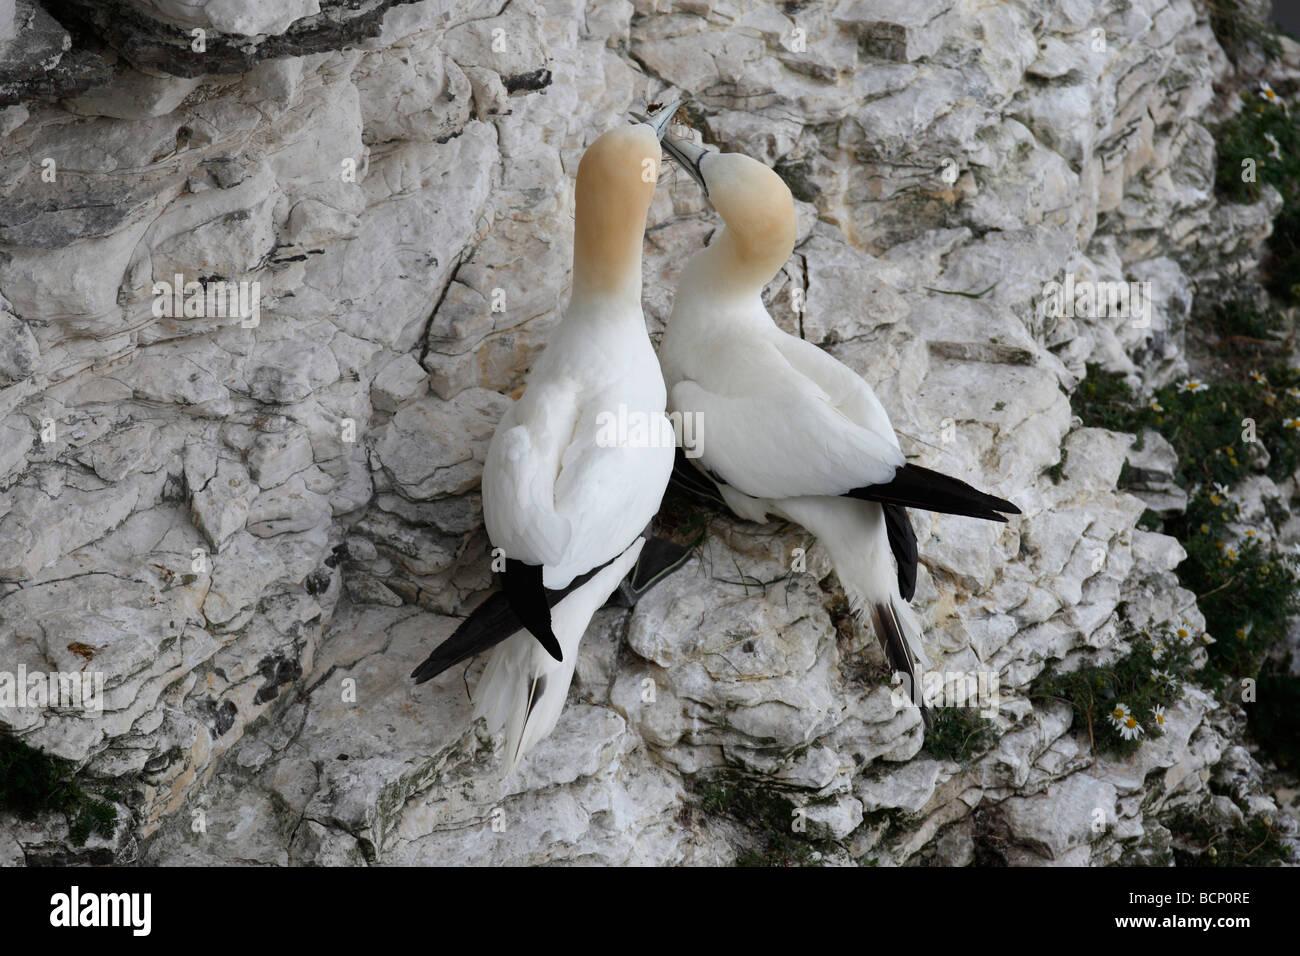 Gannet Sulu Bassana Pair bei mit nisten nest material Stockbild